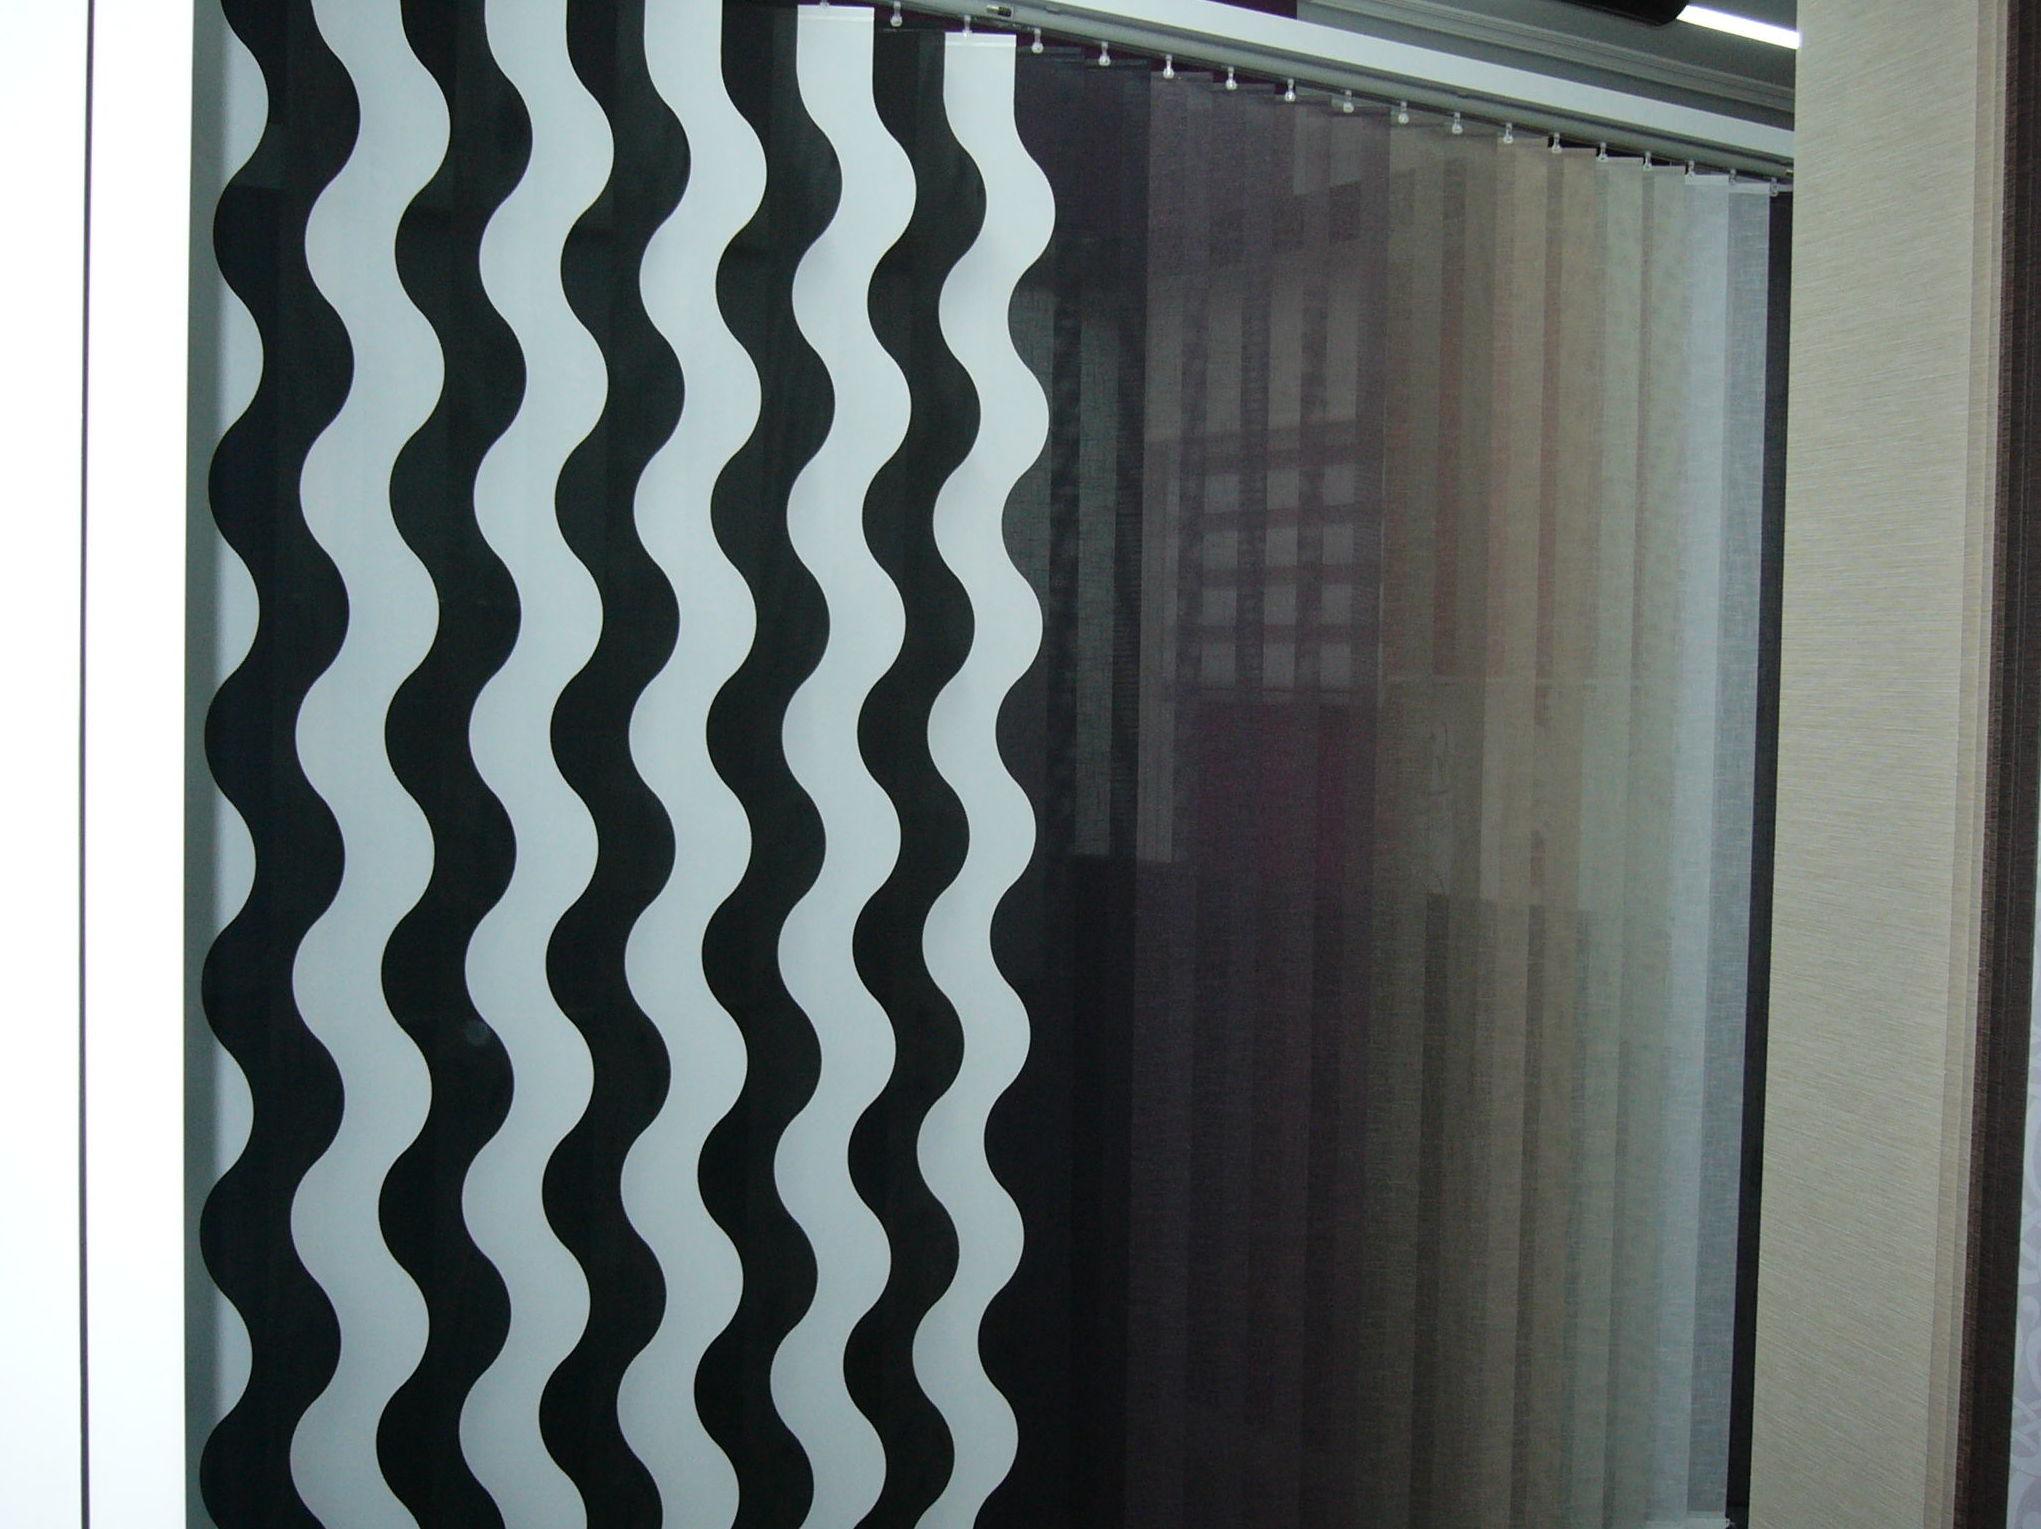 Cortinajes y textil hogar